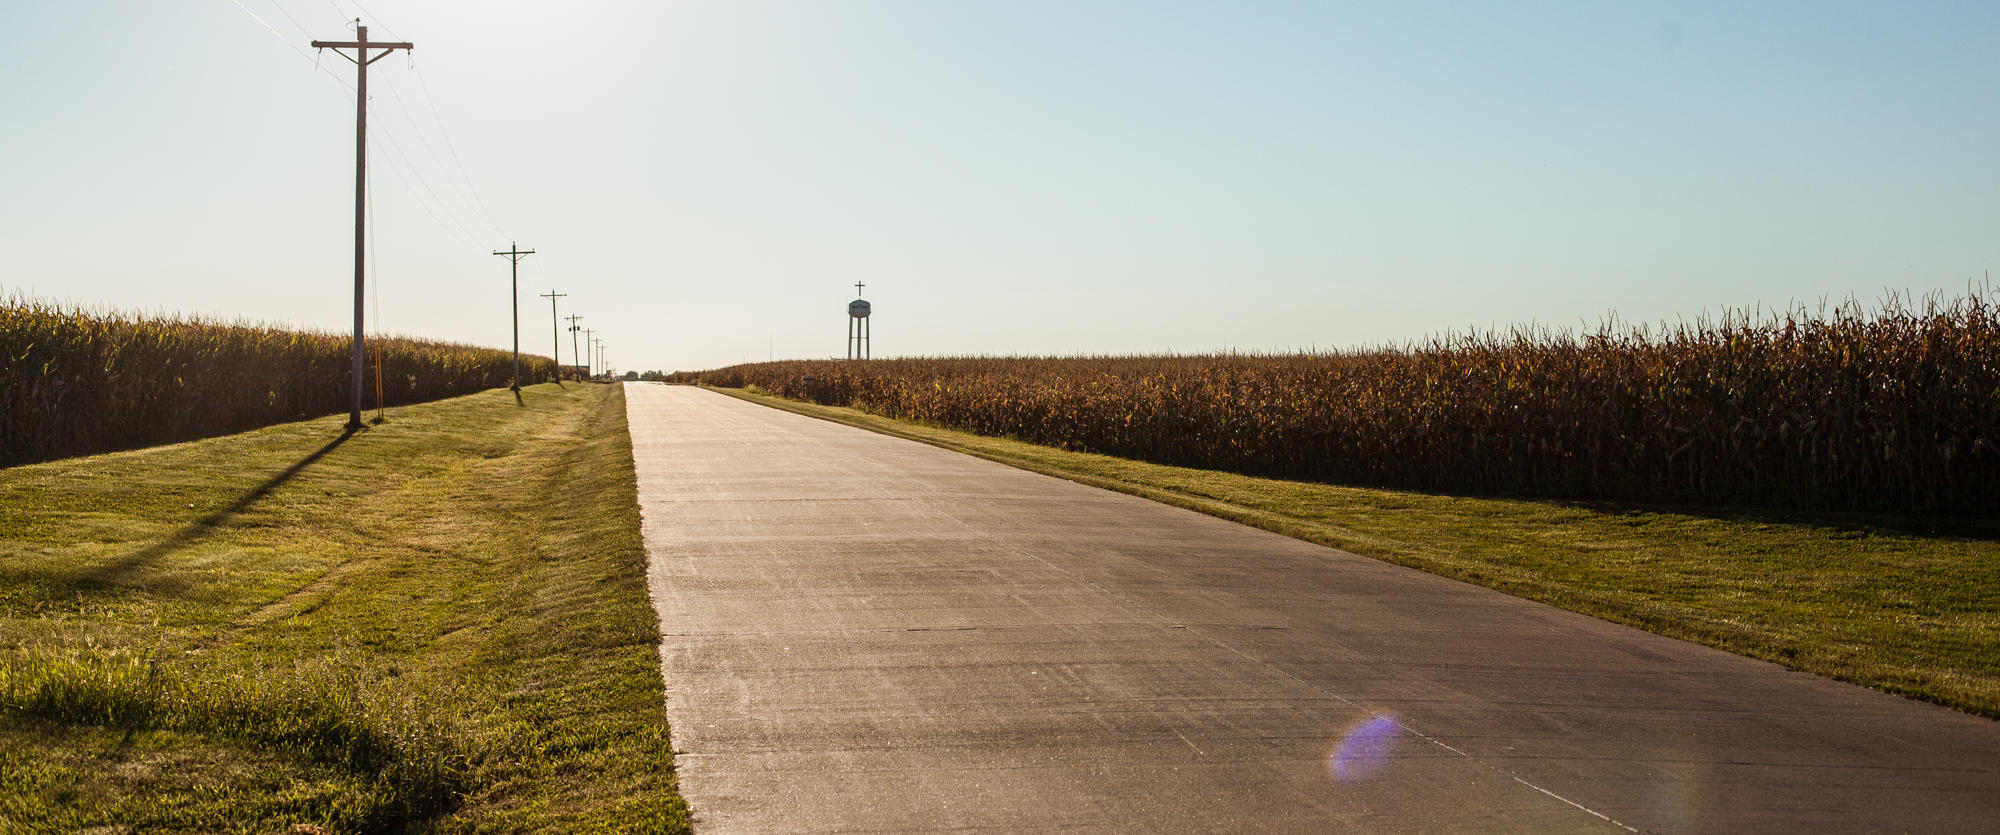 Sex stories northeast missouri state